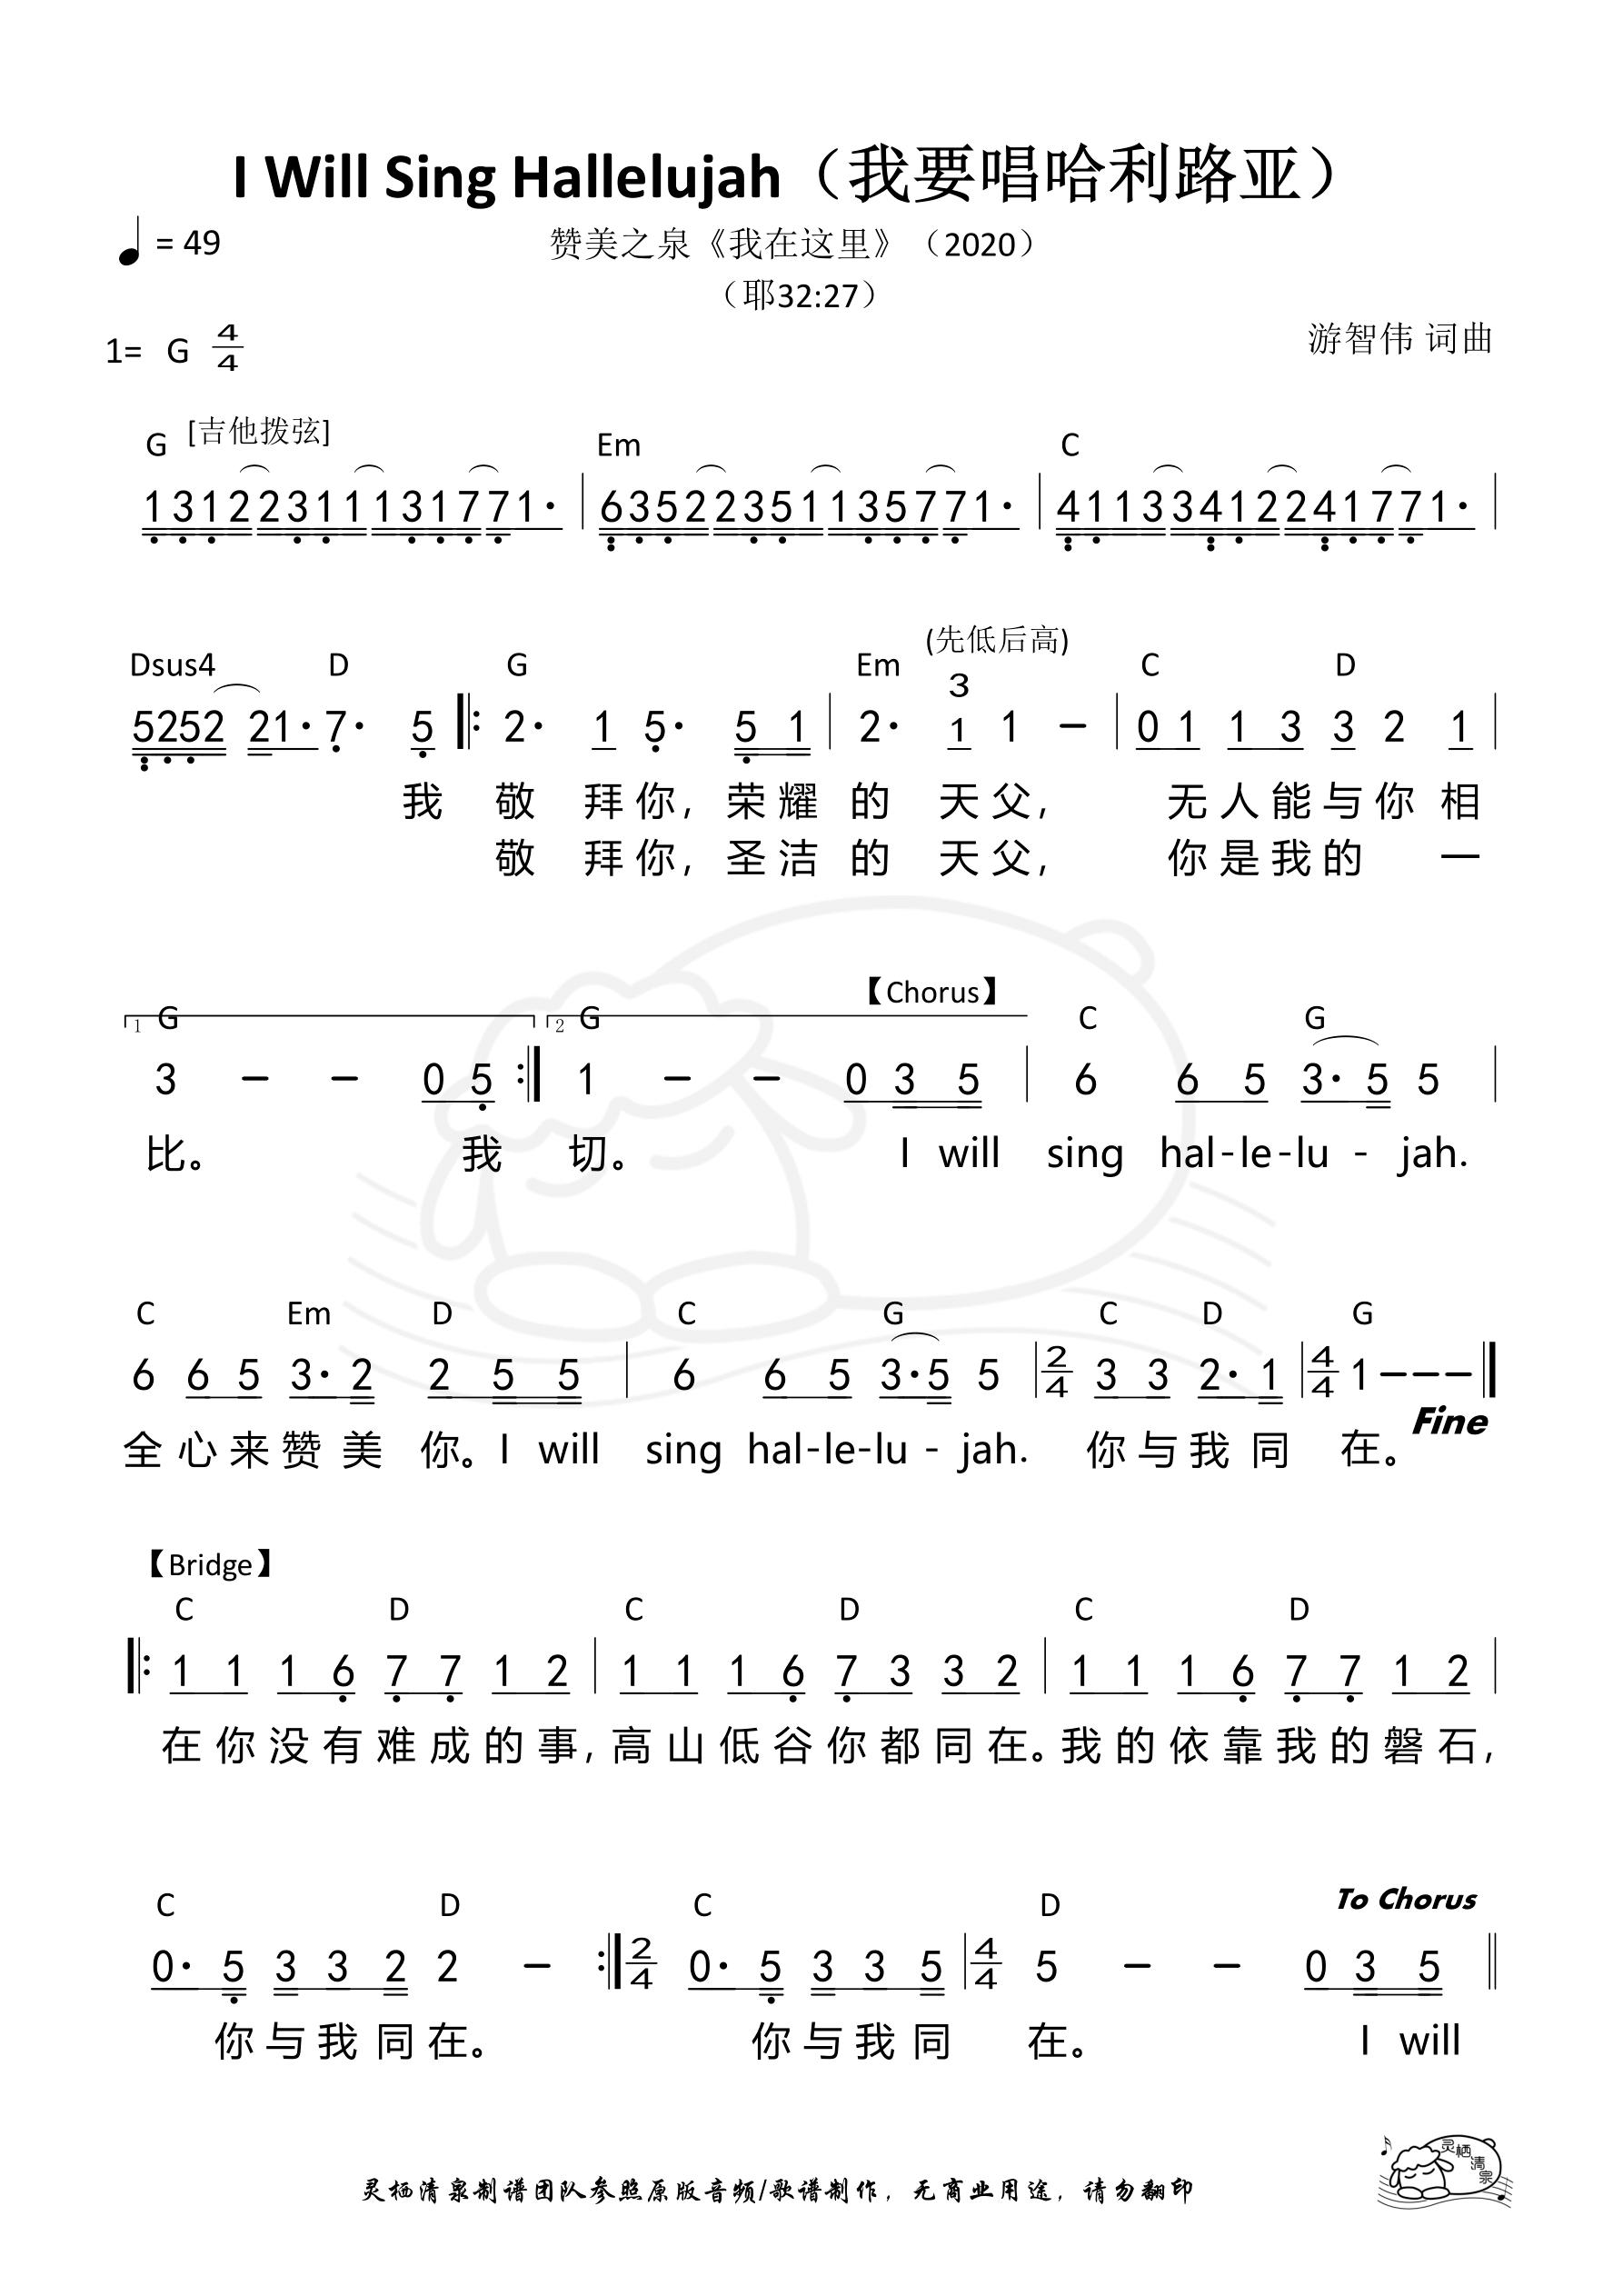 《第453首 - I Will Sing Hallelujah(我要唱哈利路亚) 和弦简谱》